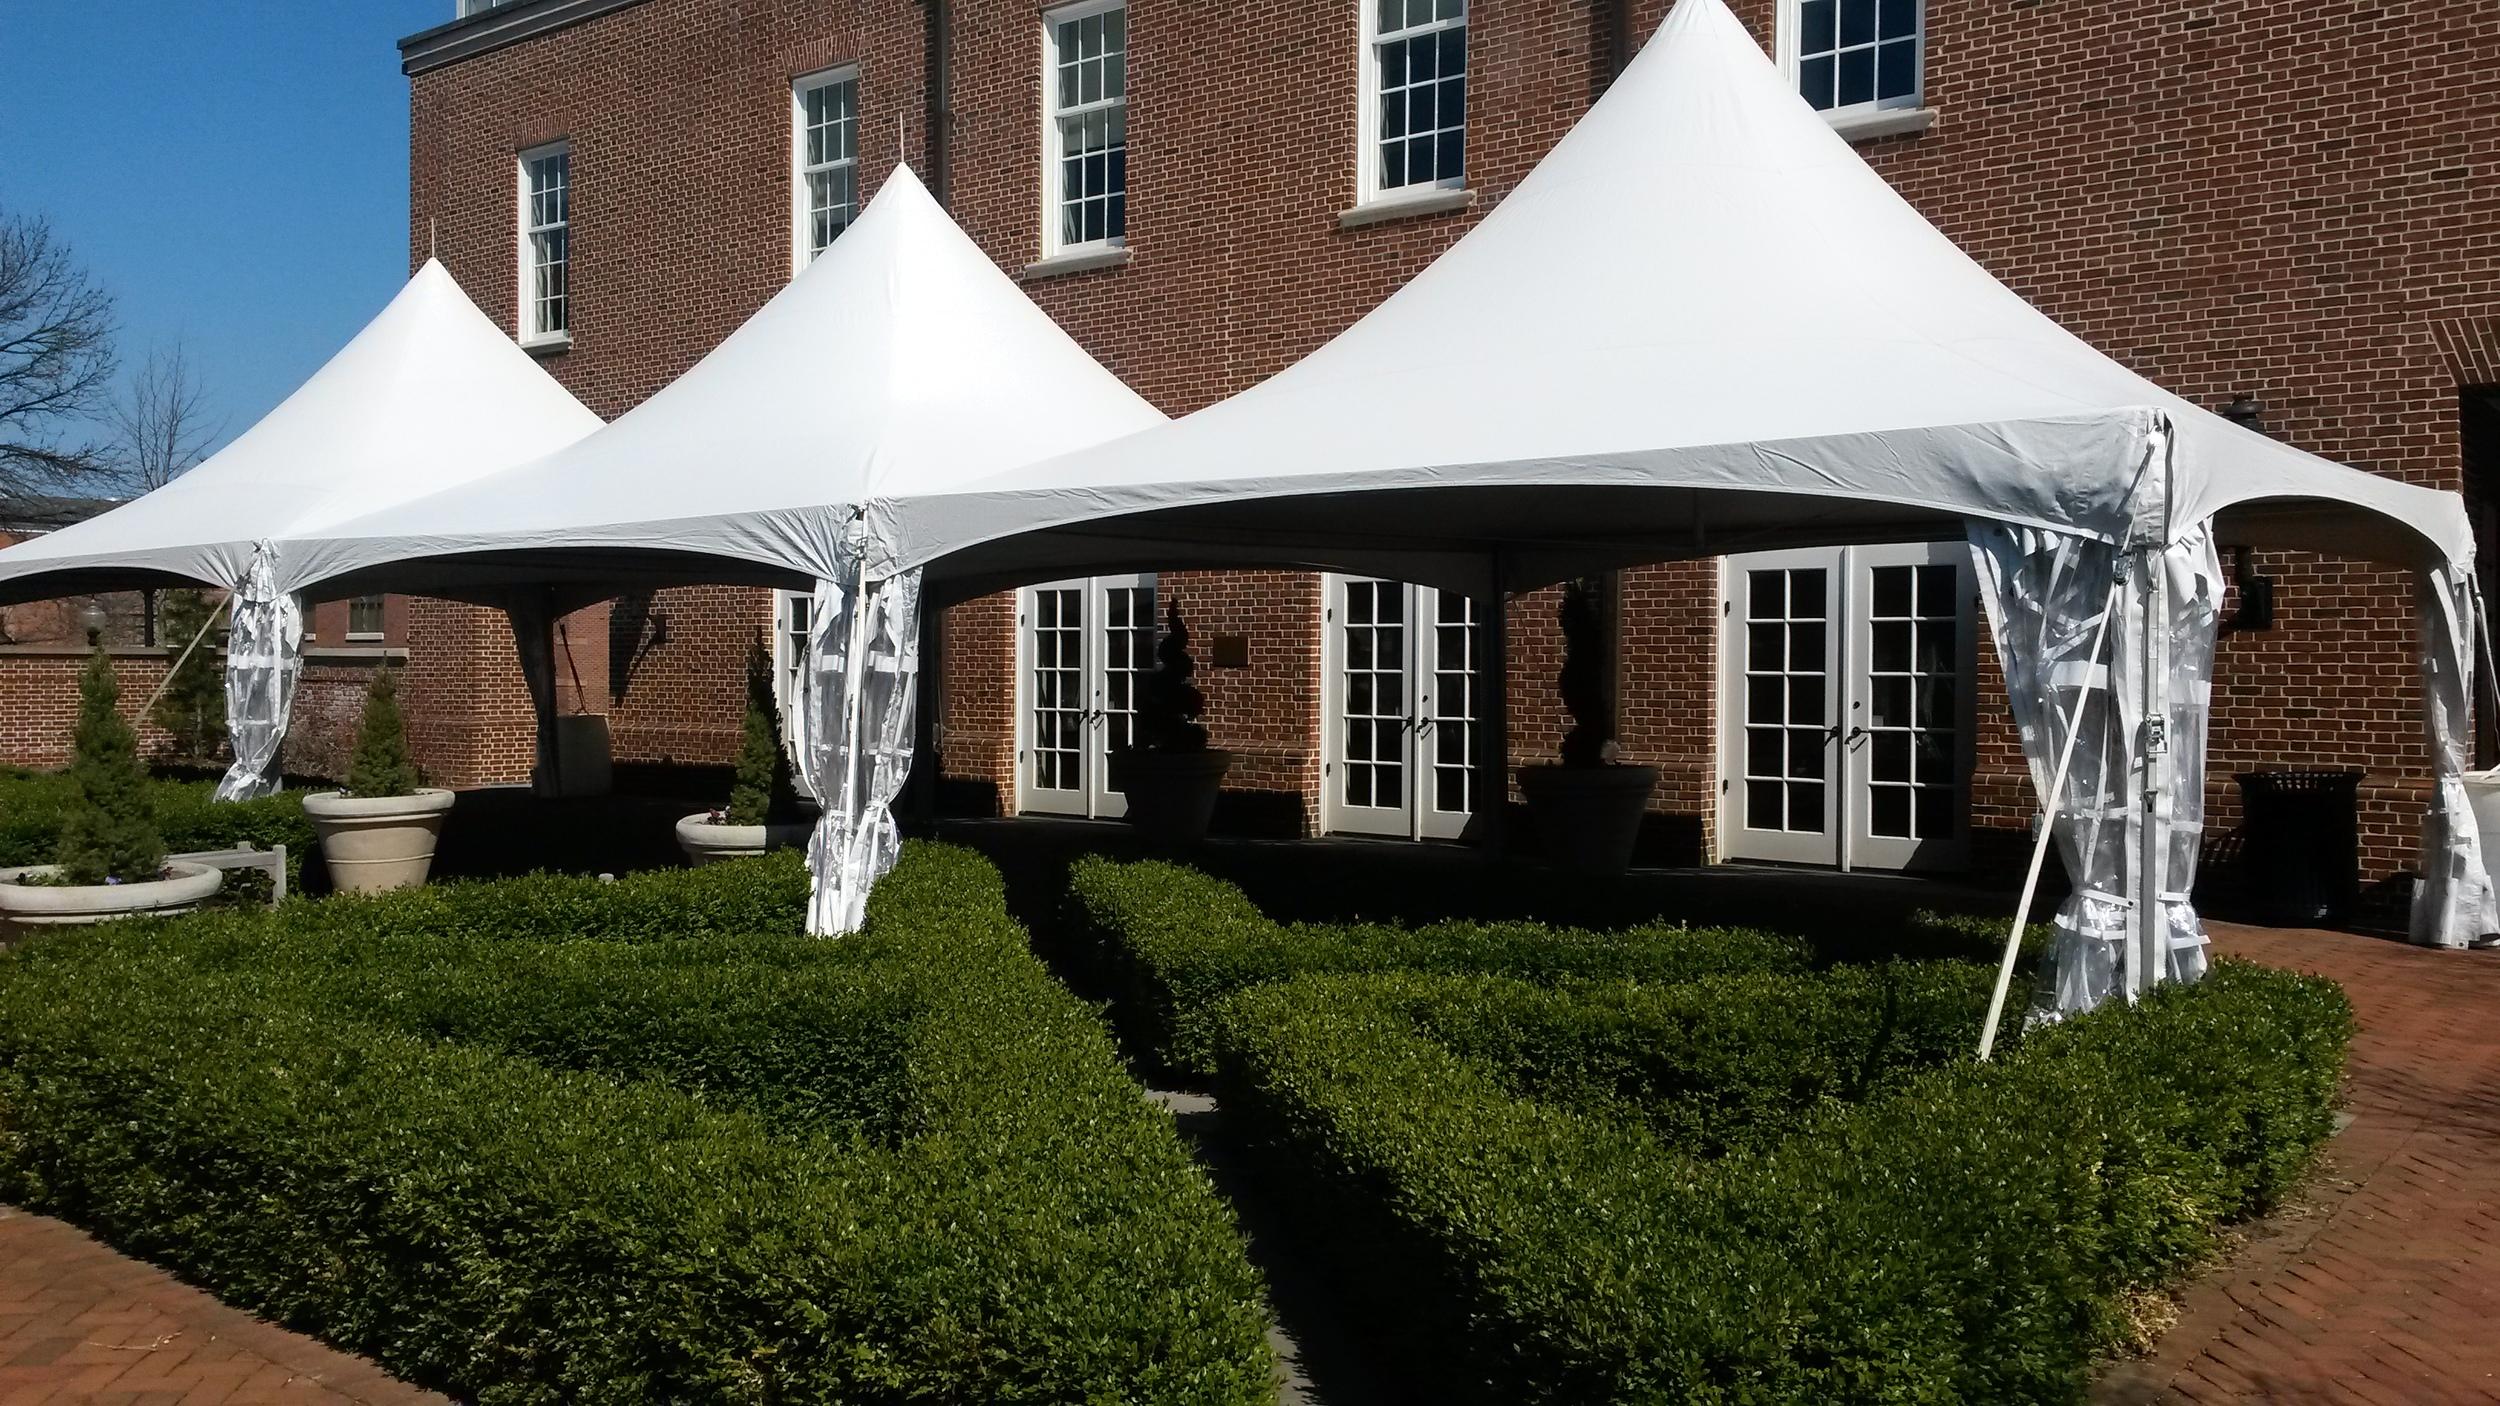 20x20 white frame tents